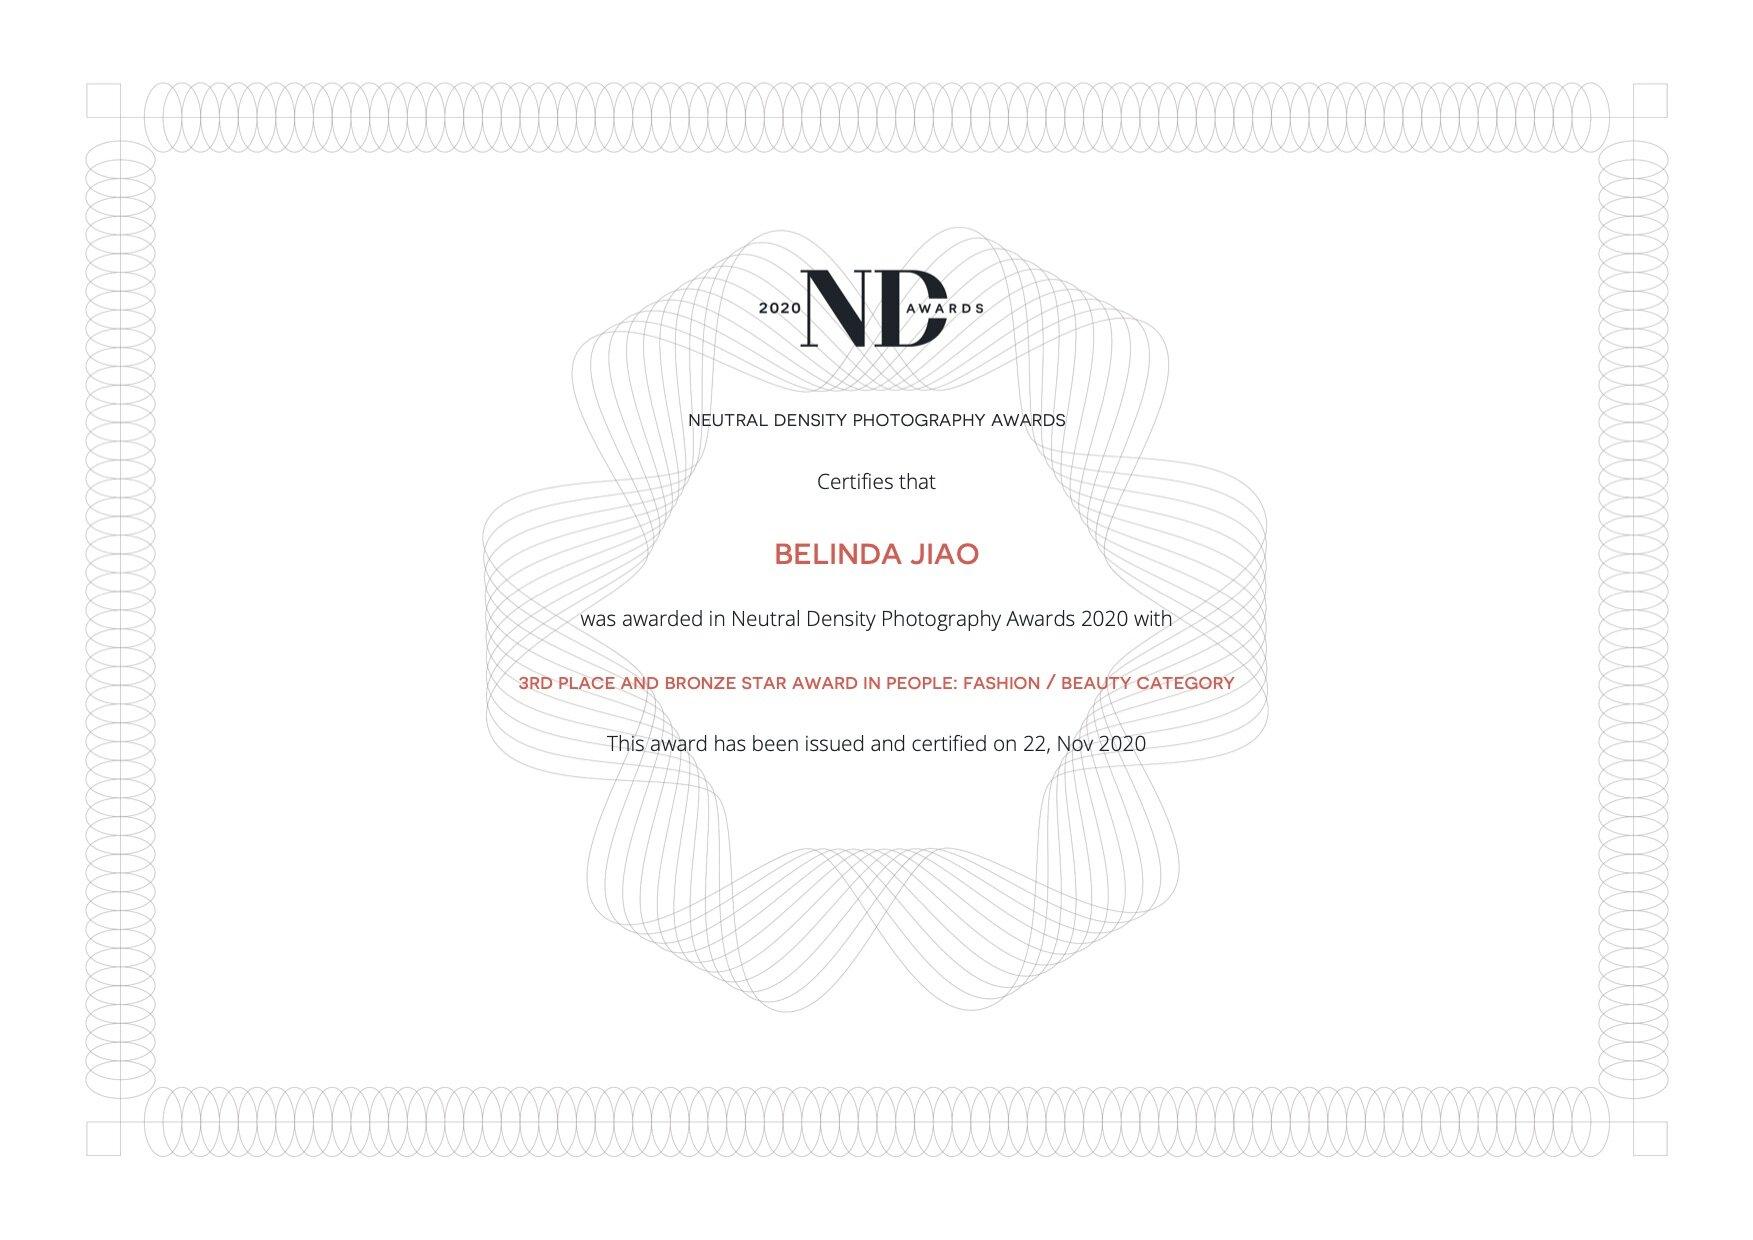 nd_certifcate_Belinda_Jiao.jpg